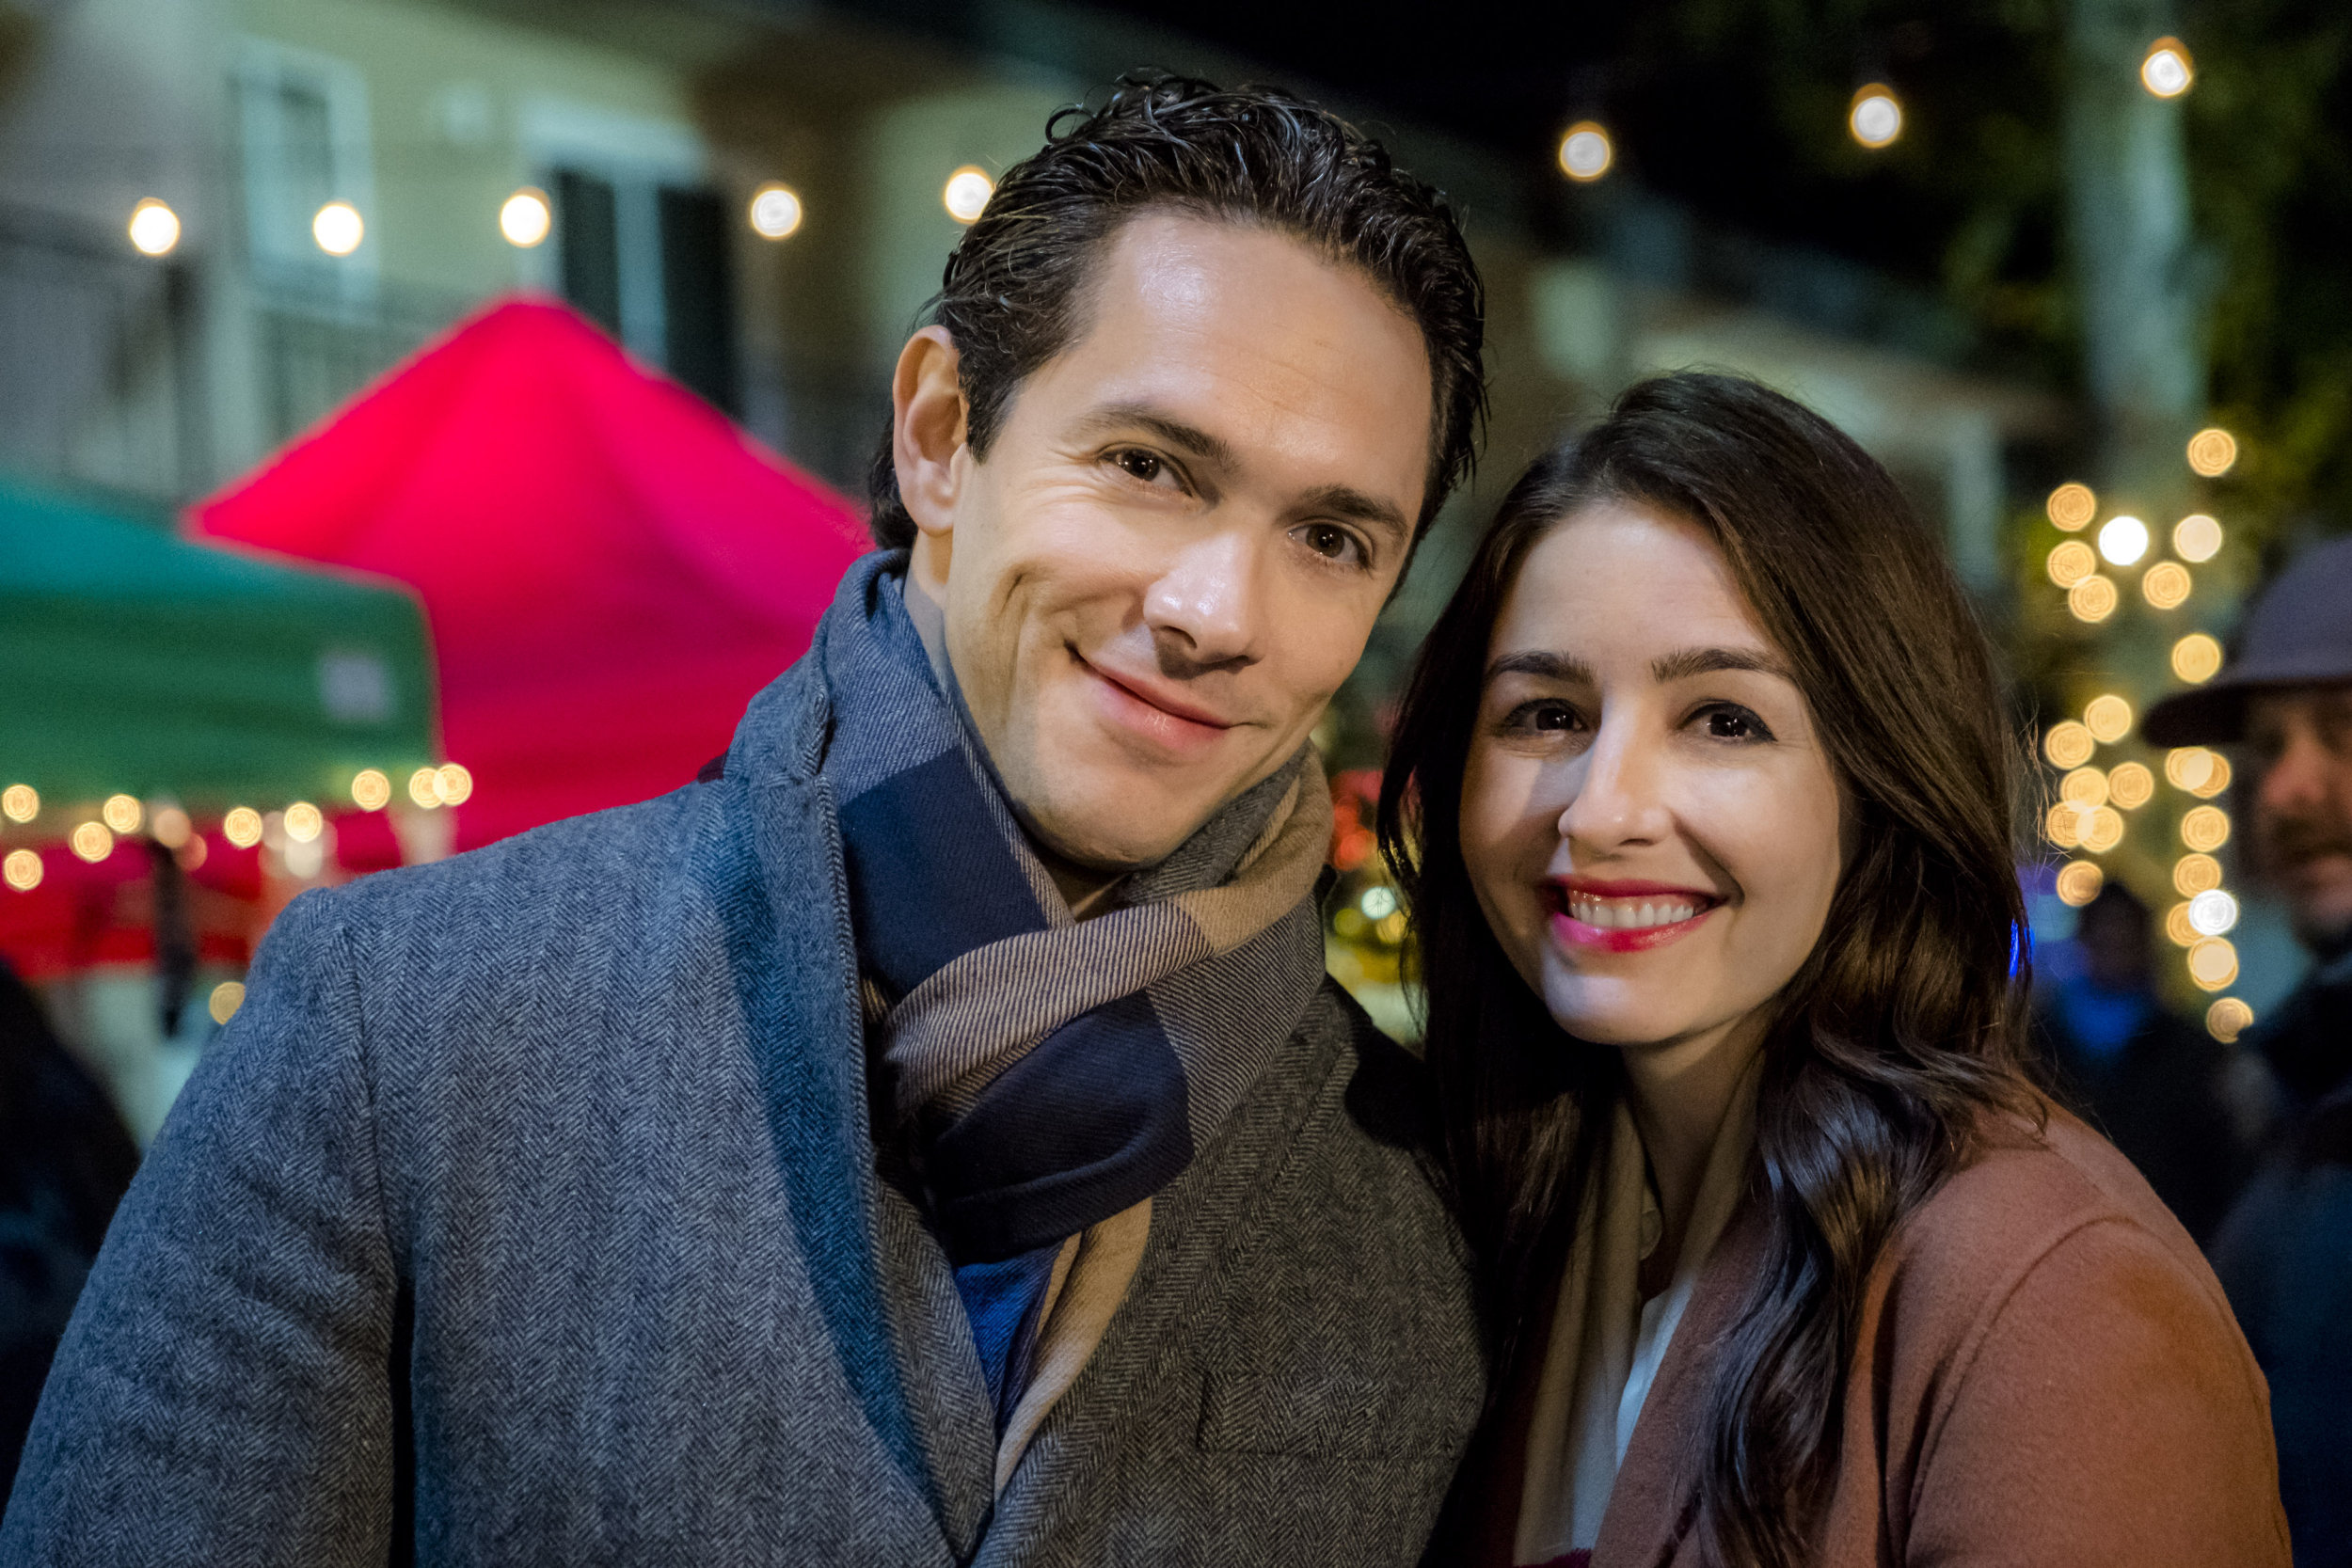 A Joyous Christmas Cast.A Joyous Christmas Cast Hallmark Movies And Mysteries